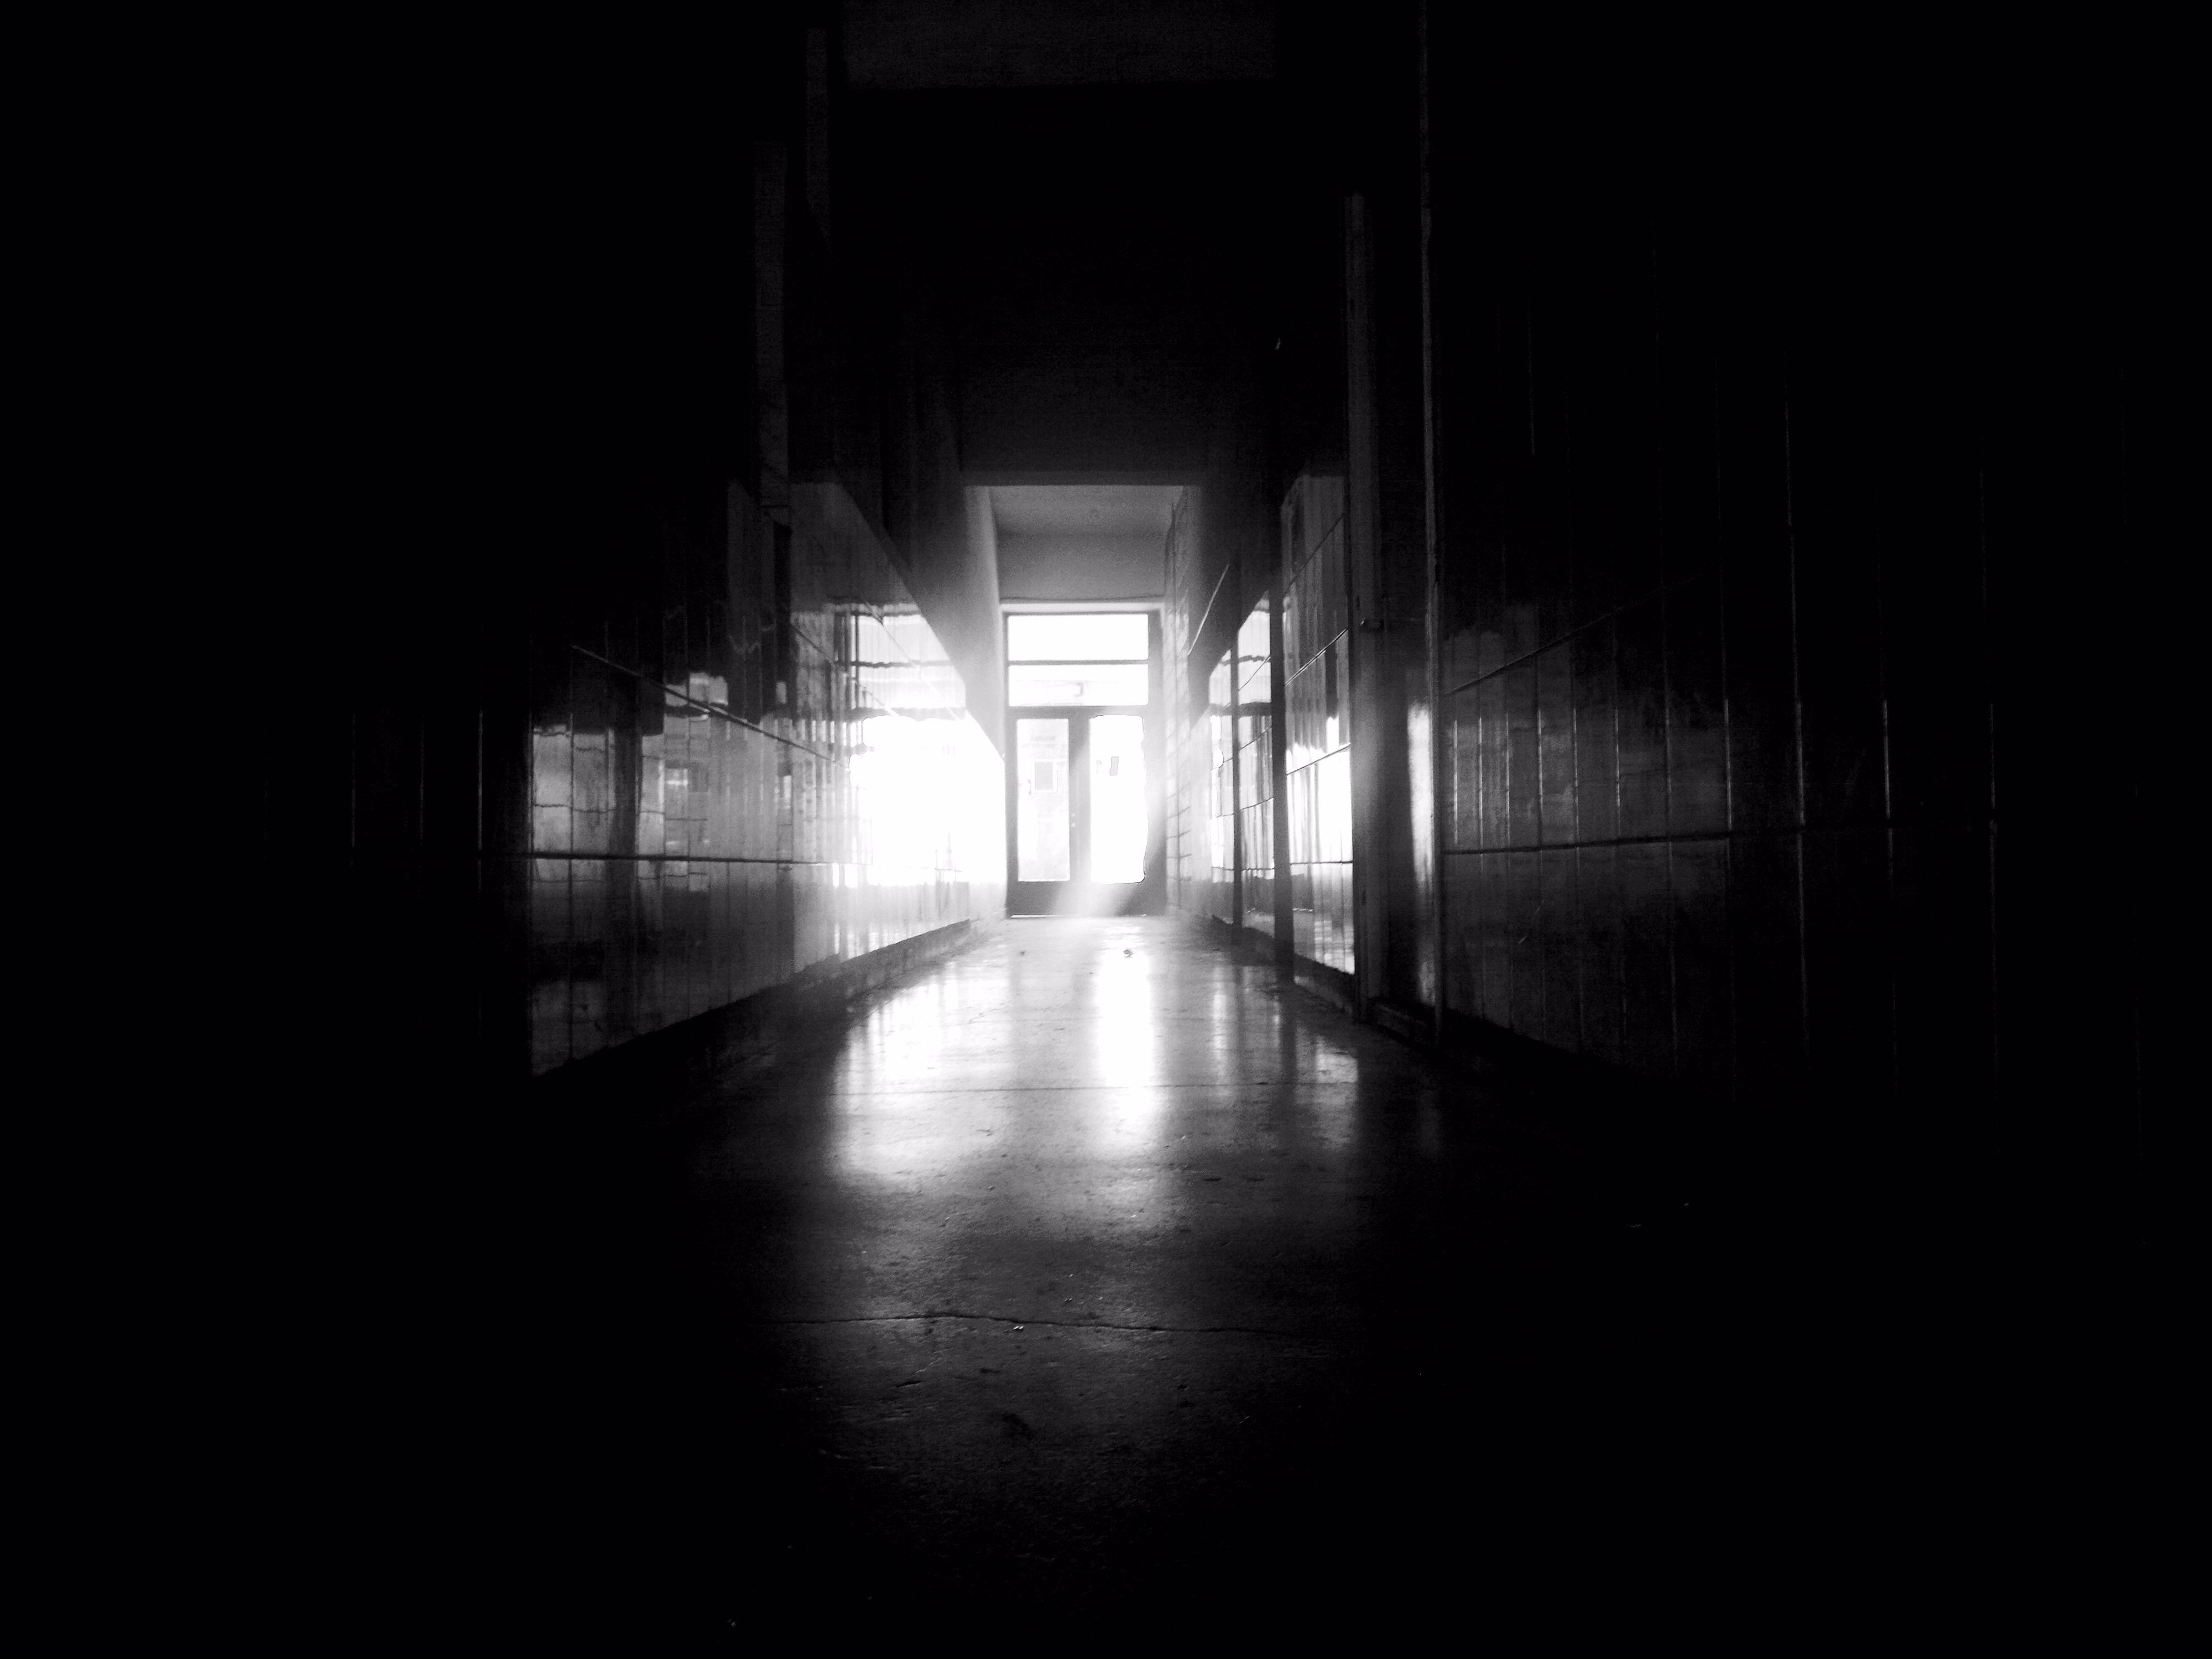 bw dark hallway by LETSOC bw dark hallway by LETSOC